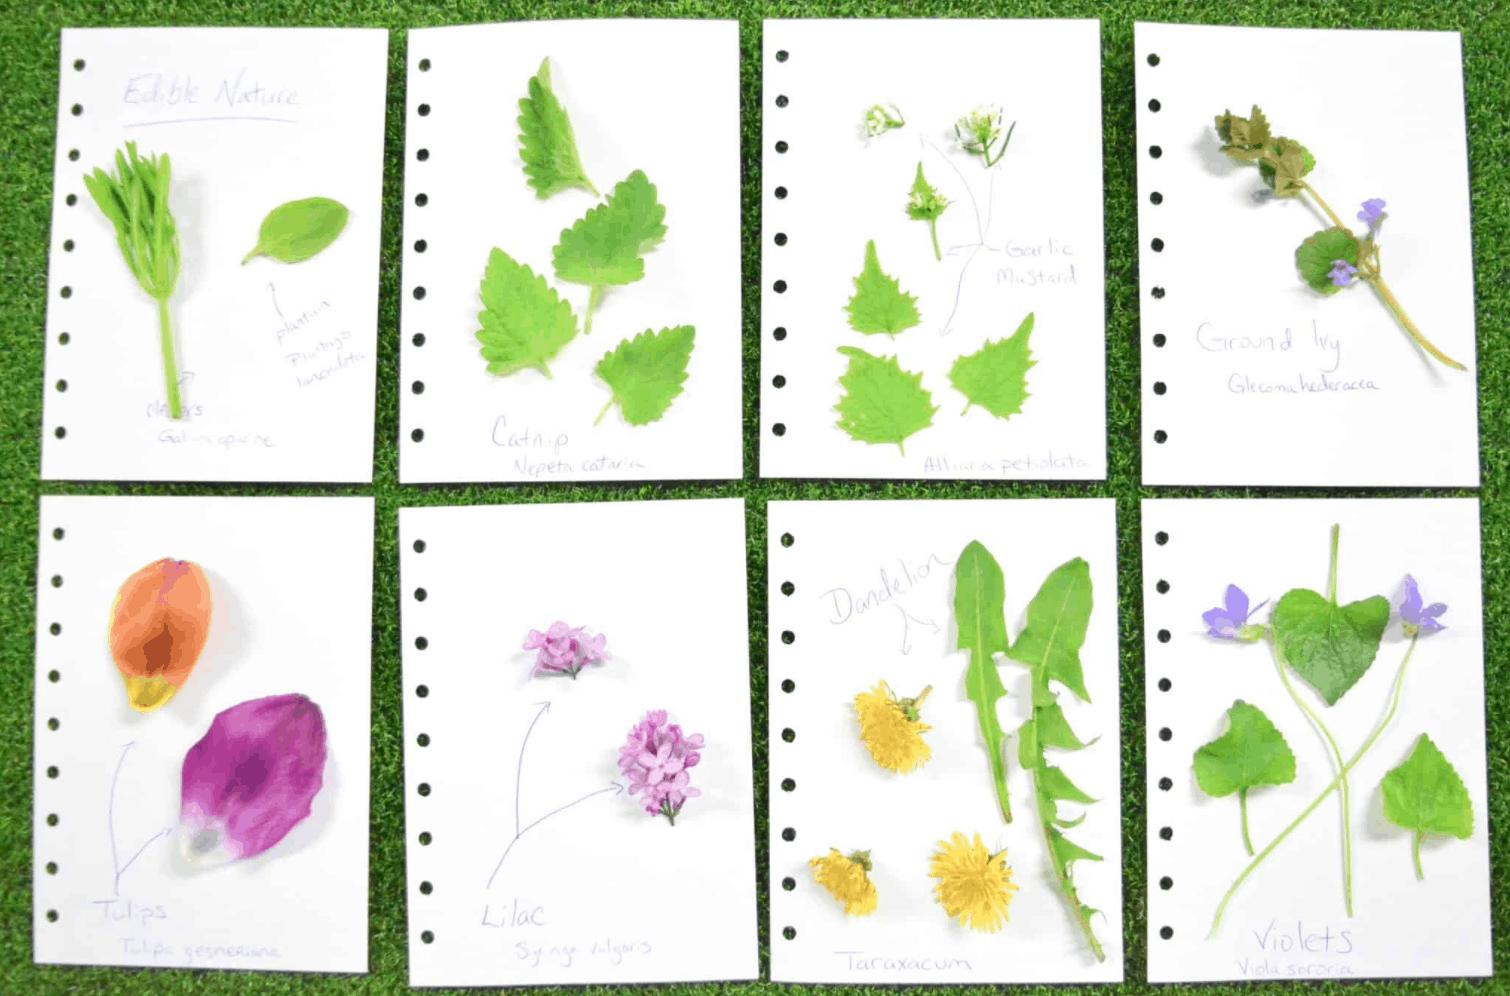 layout of pressing flowers field journal